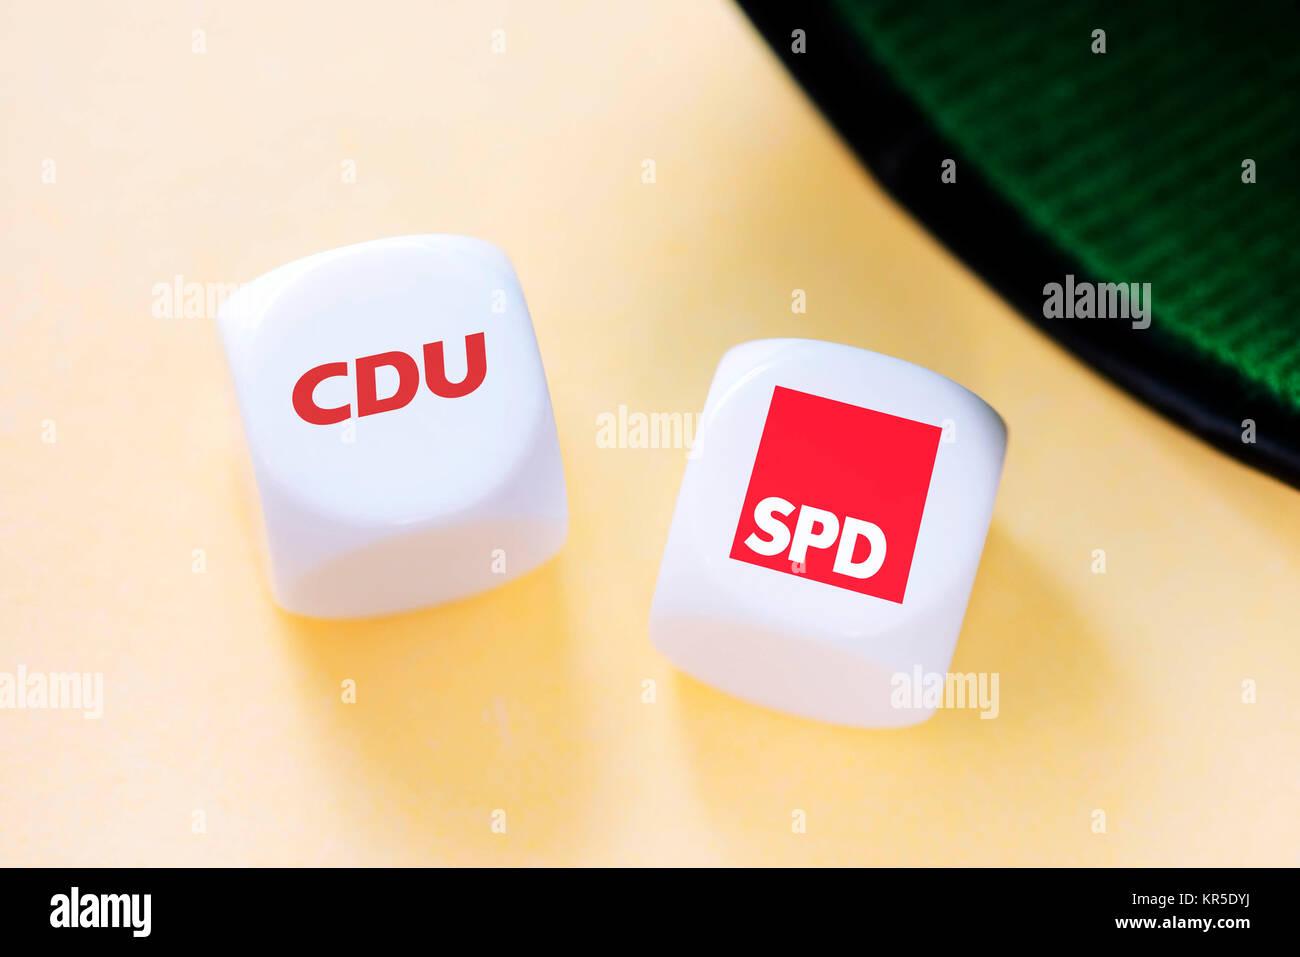 Cube with the logo of CDU and SPD, symbolic photo for the grand coalition, Würfel mit dem Logo von CDU und - Stock Image